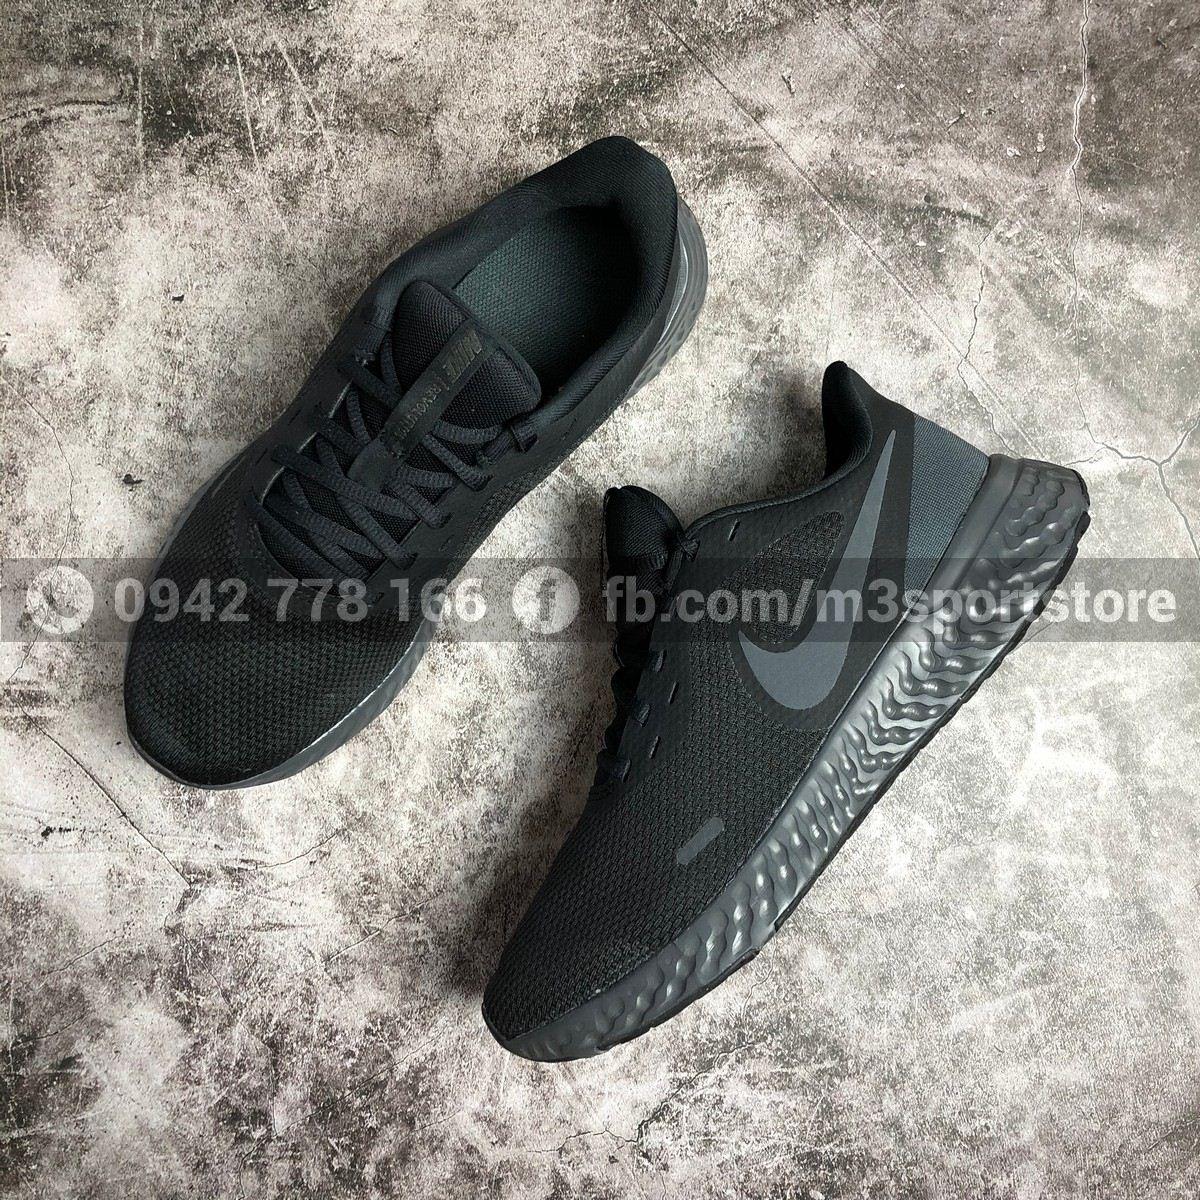 Giầy thể thao nam Nike Revolution 5 BQ3204-001